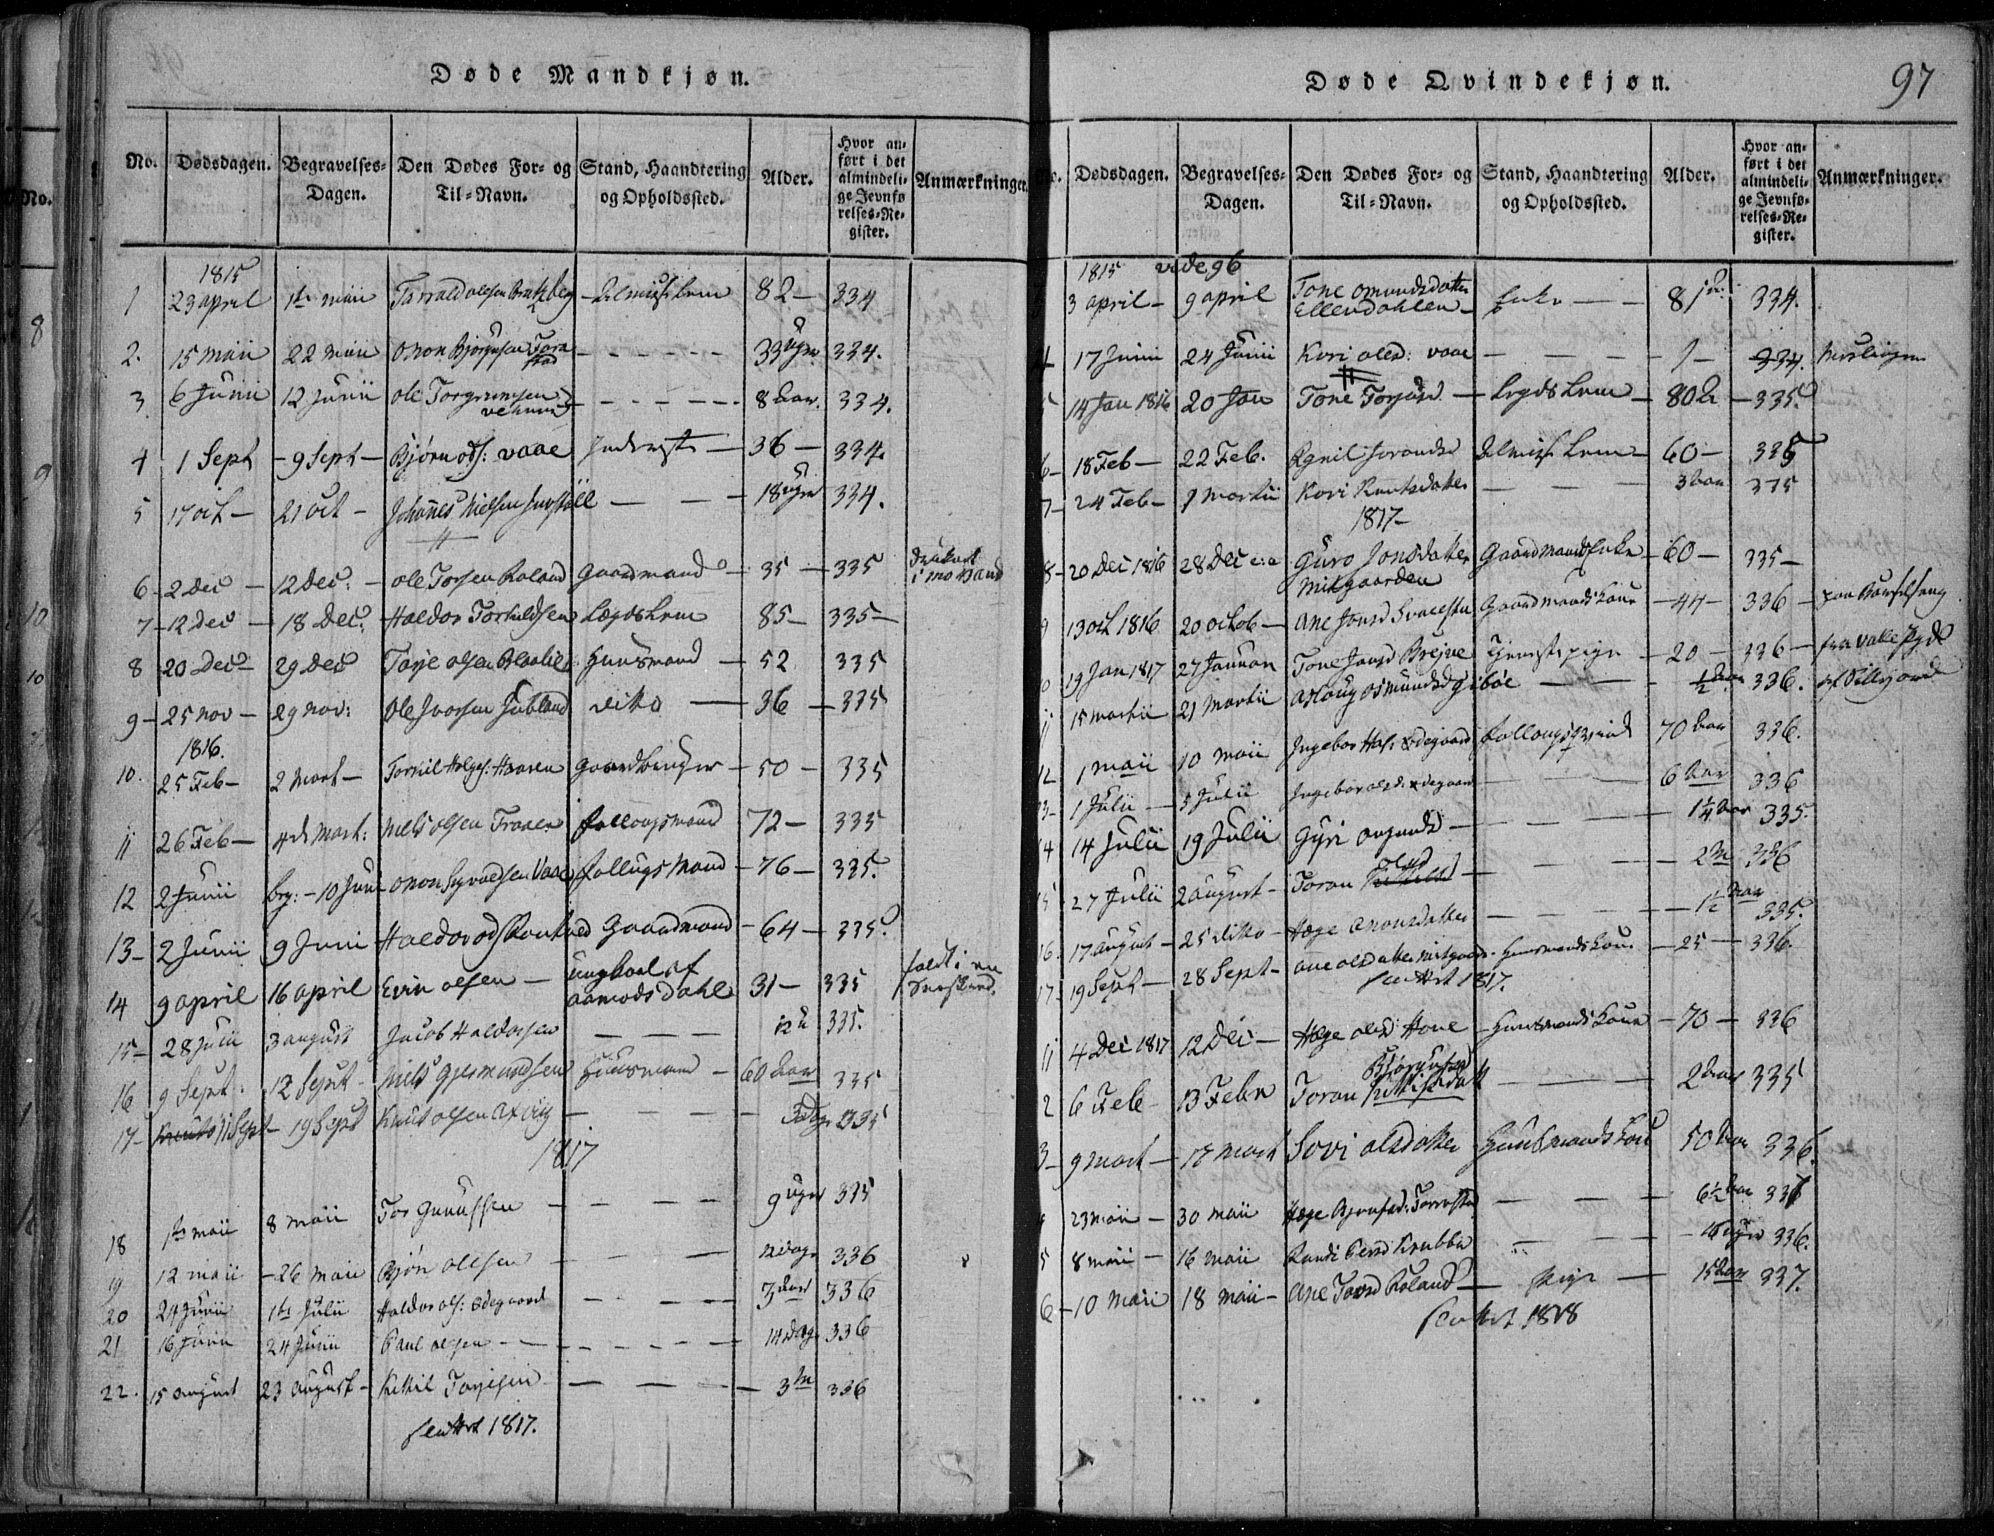 SAKO, Rauland kirkebøker, F/Fa/L0001: Ministerialbok nr. 1, 1814-1859, s. 97